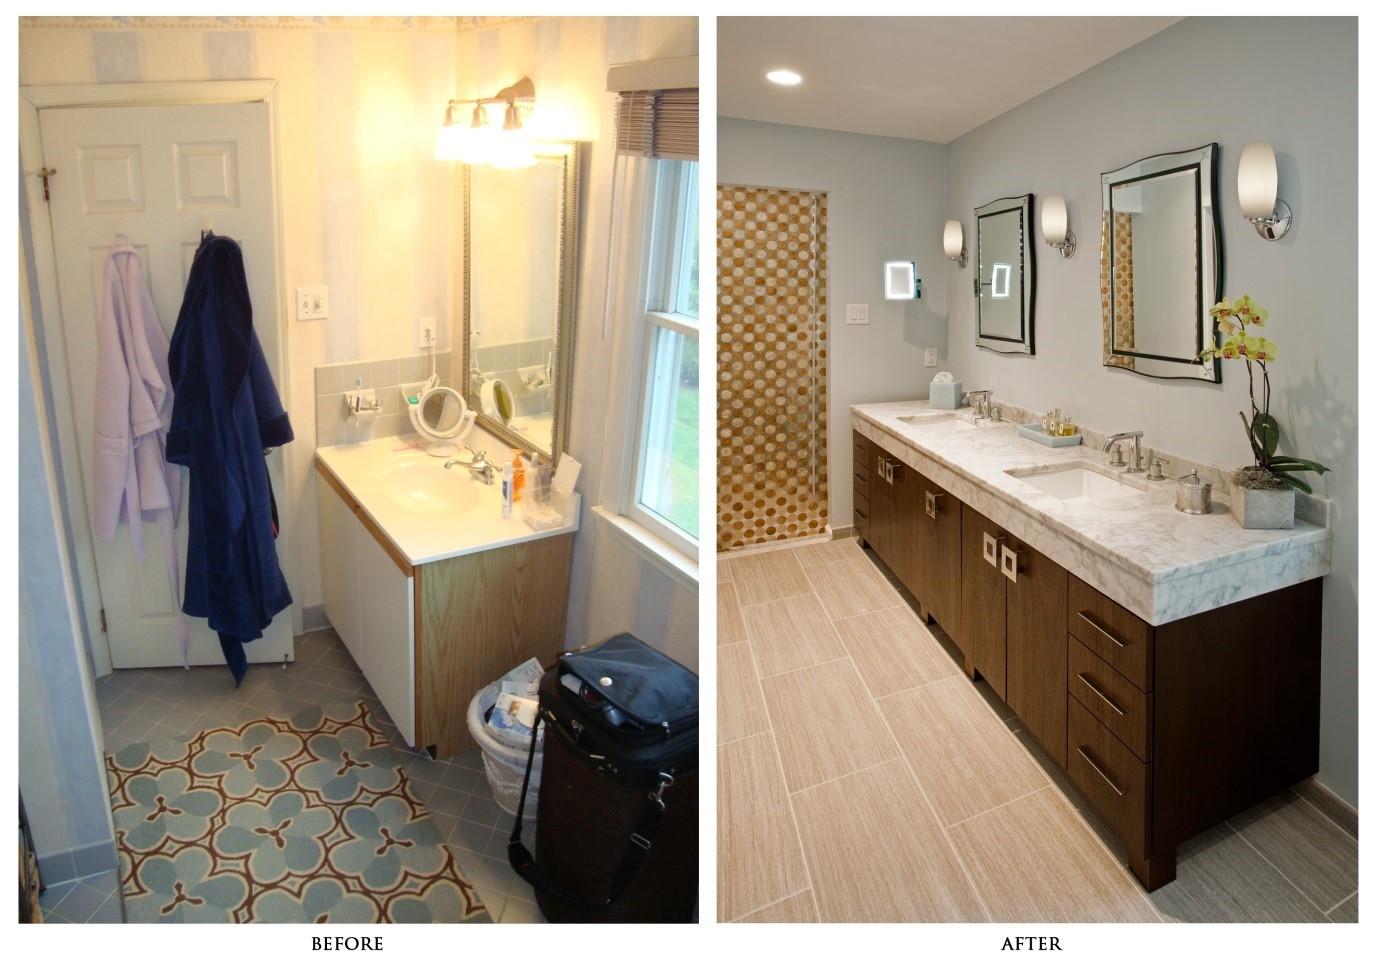 Community 39 s personal handyman in staten island ny 10305 for Bathroom remodel staten island